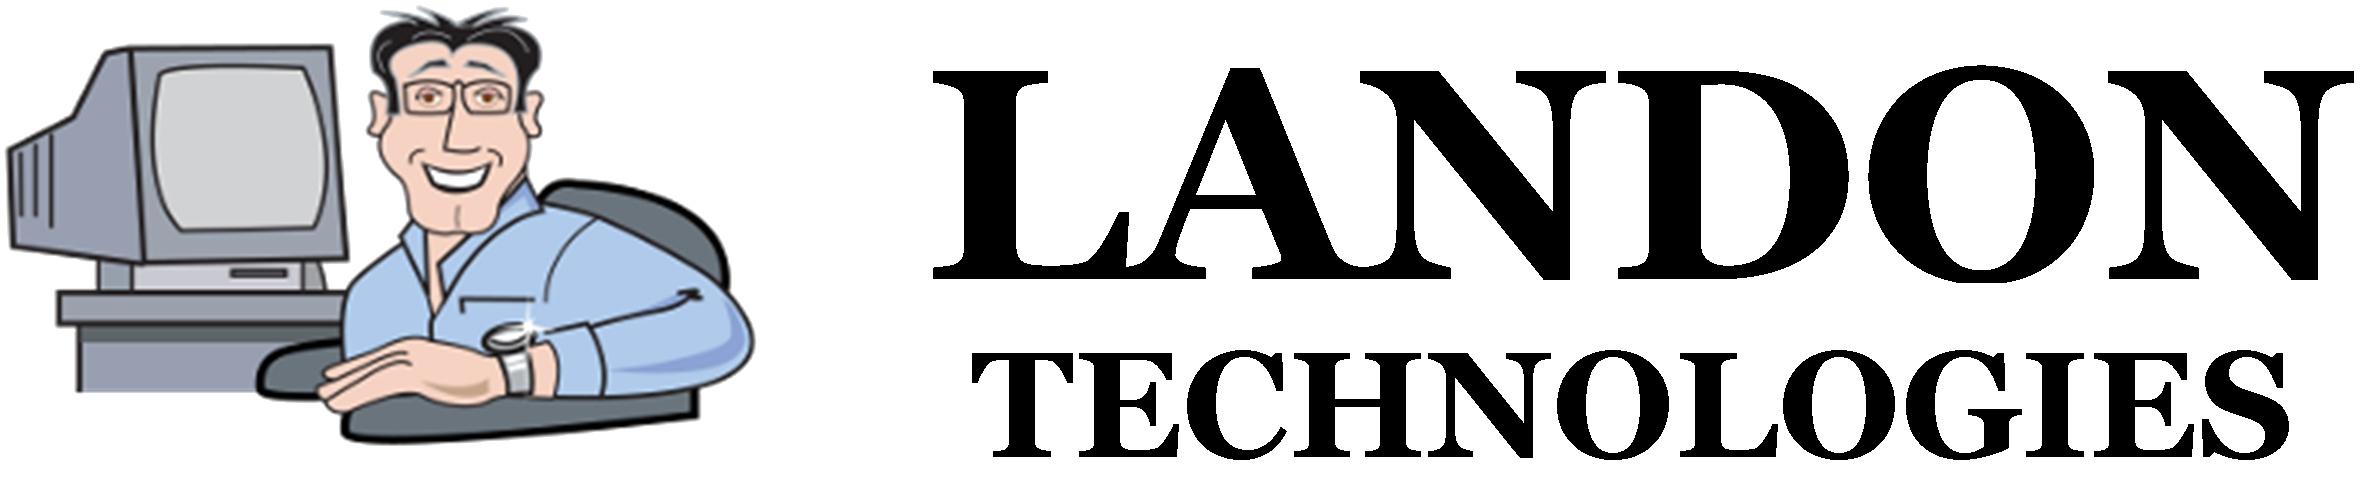 landon technologies, llc